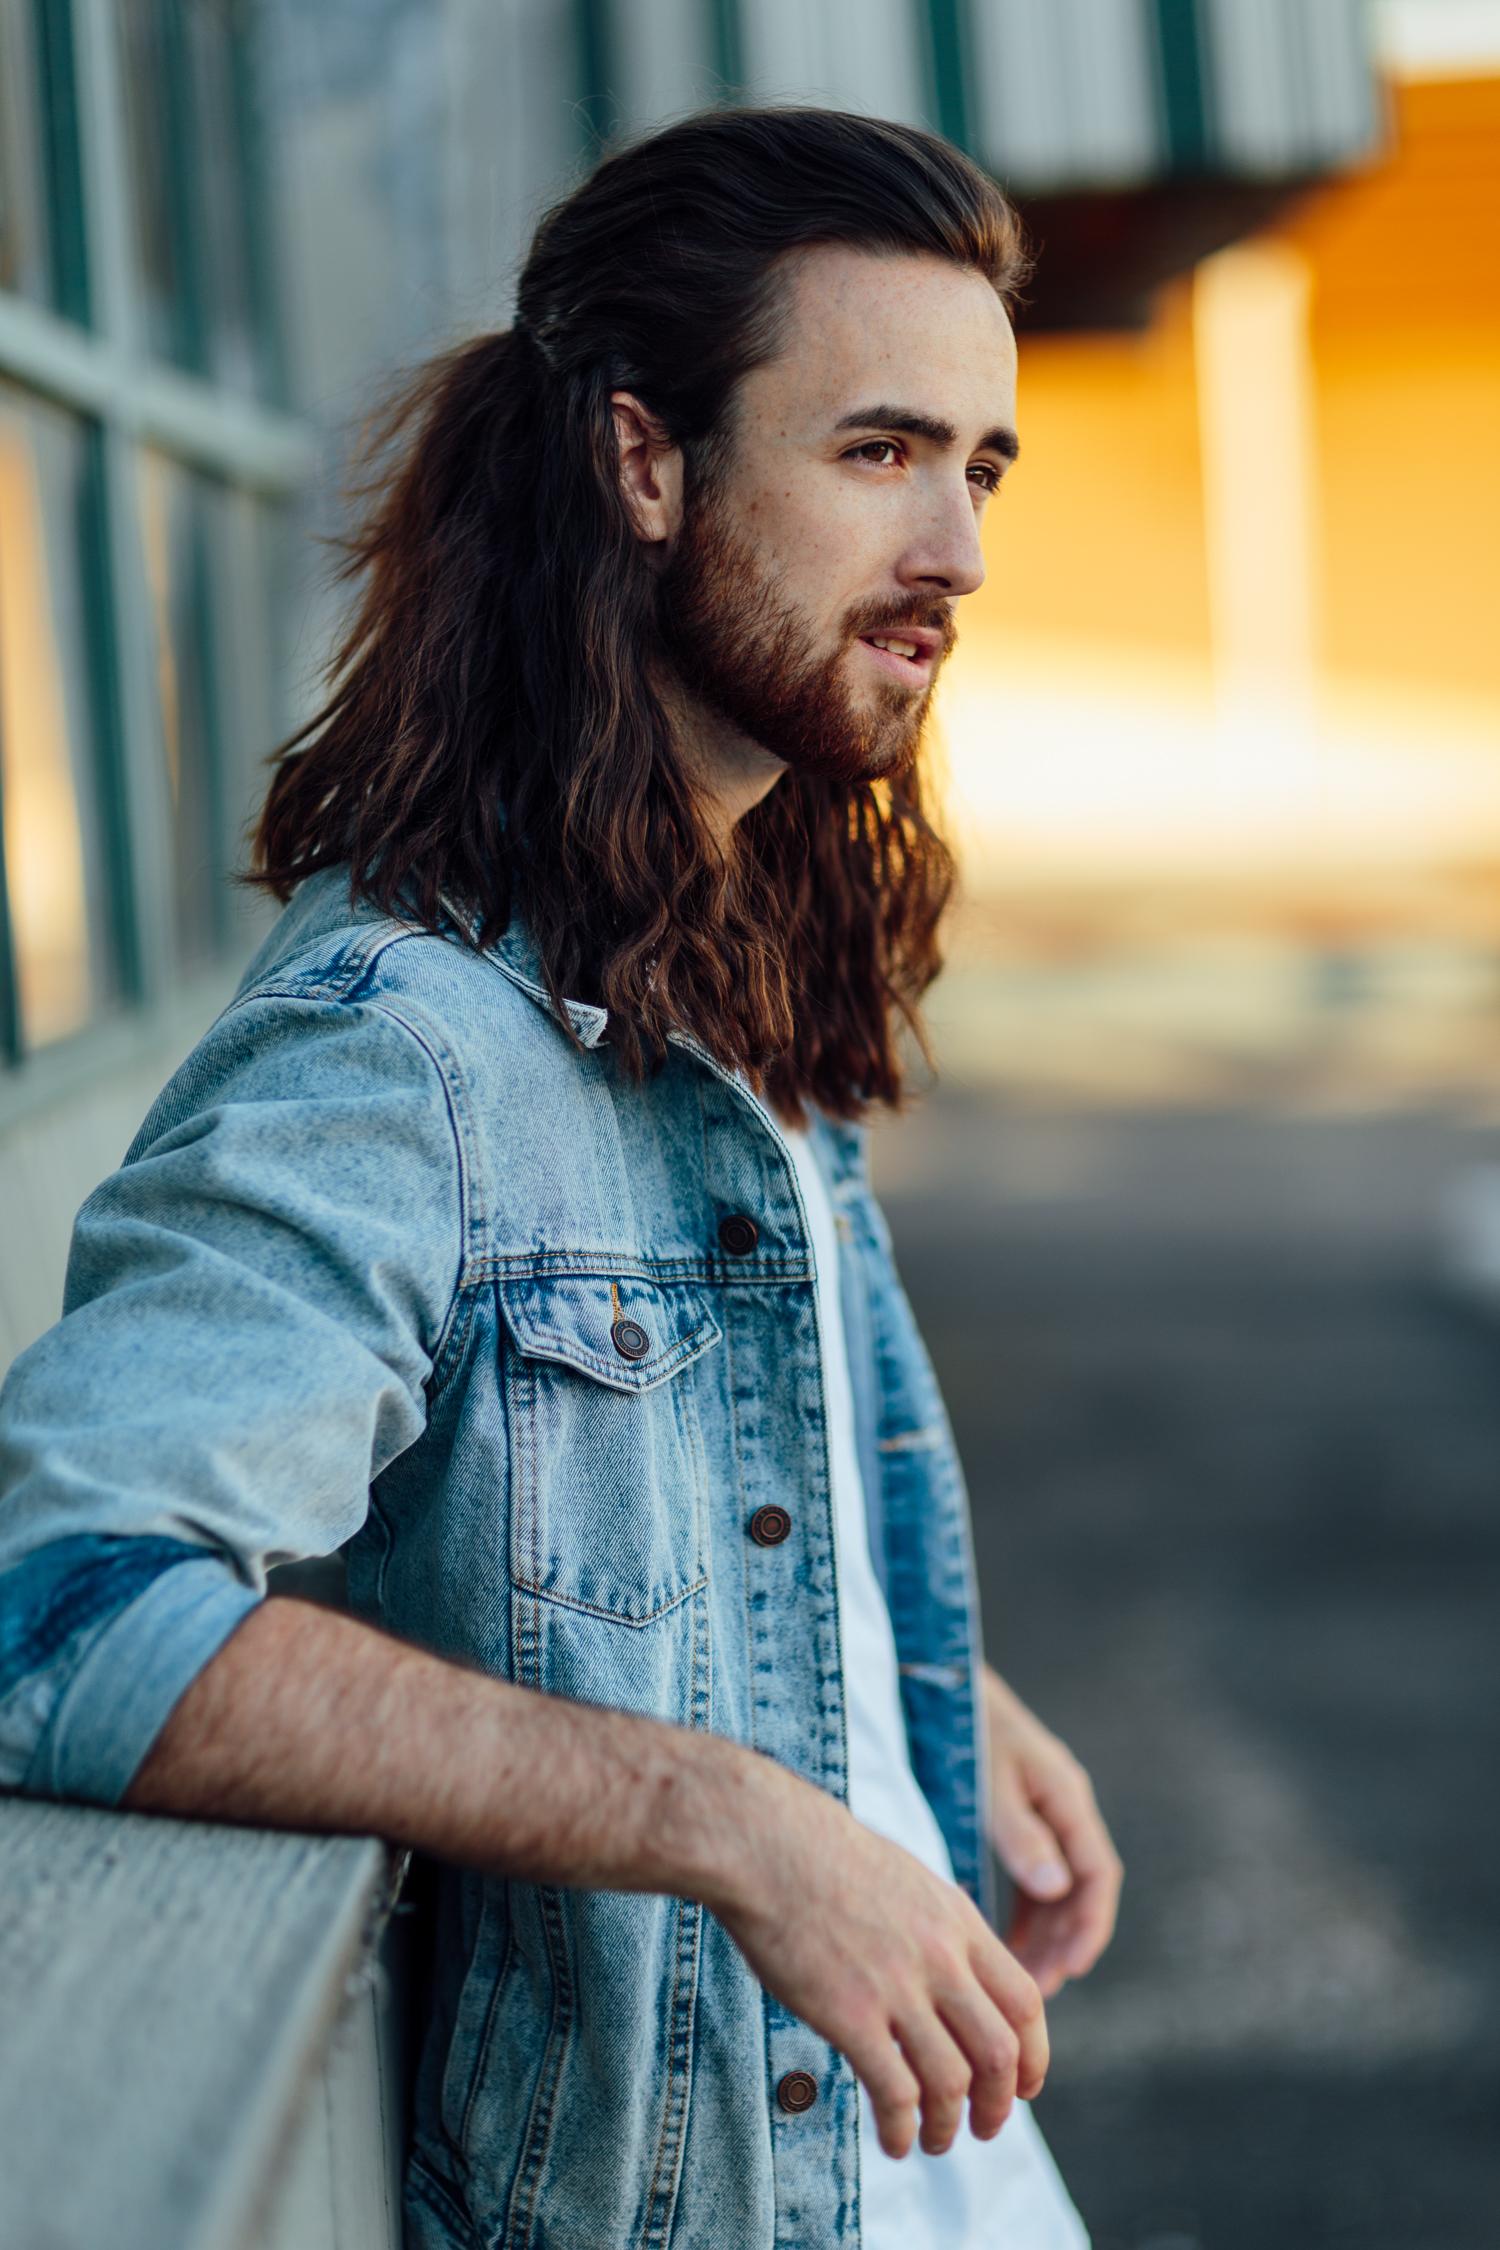 ariellanoellephotography-male-model-photoshoot-seattle-area-senior-guy-portraits-headshots-1-21.jpg